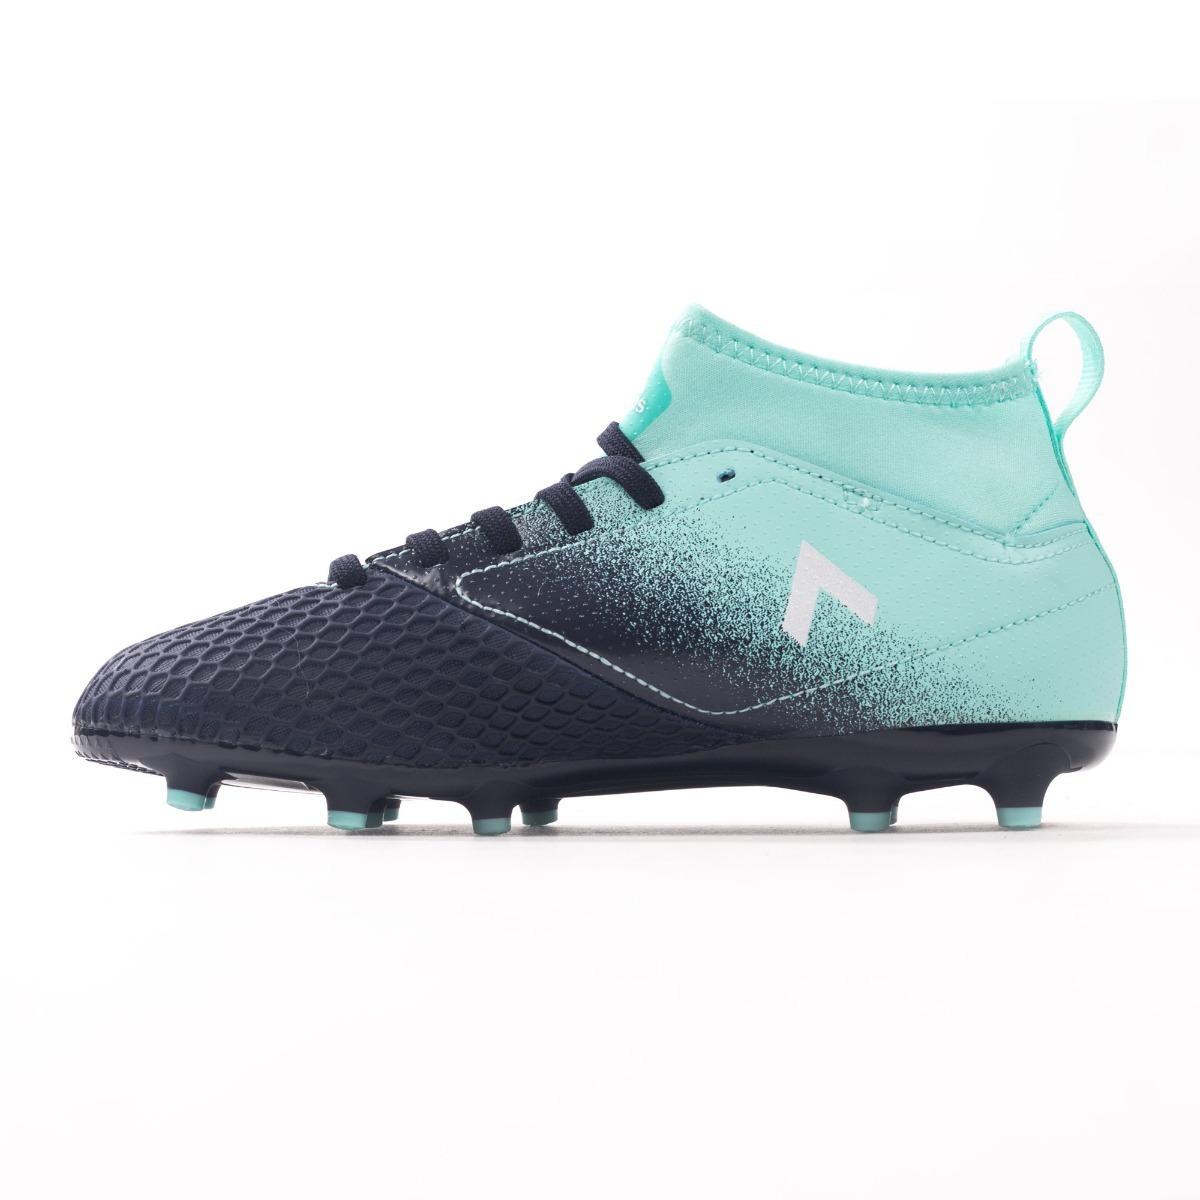 Botines Fútbol Botita adidas Ace 17.3 Fg Niños On Sports -   2.269 ... 8a05a599ed4dc